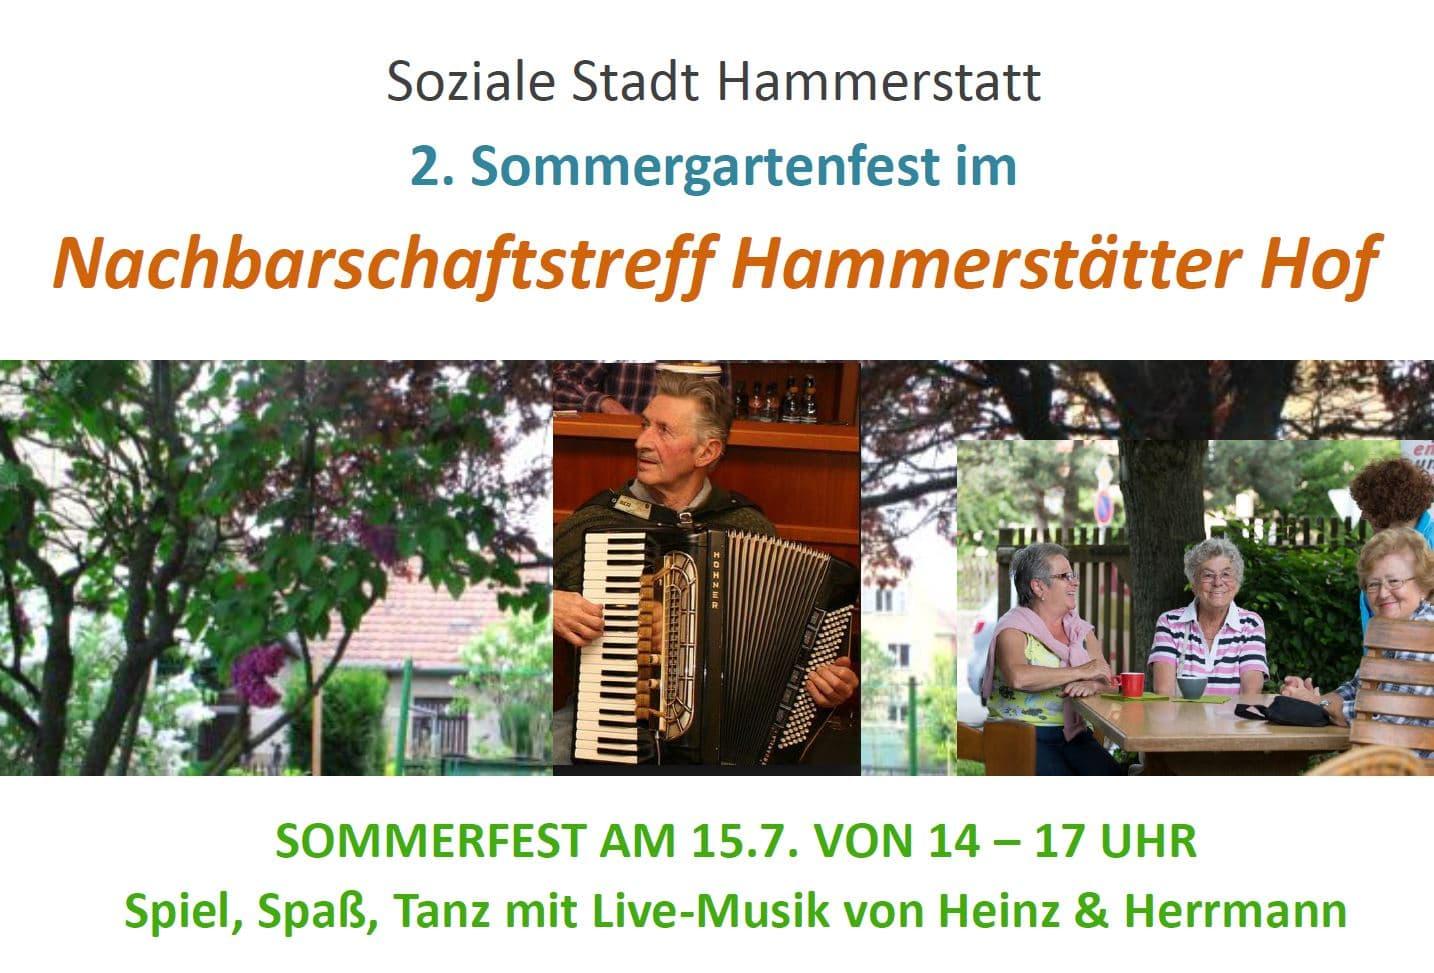 Plakatkopf Sommergartenfest